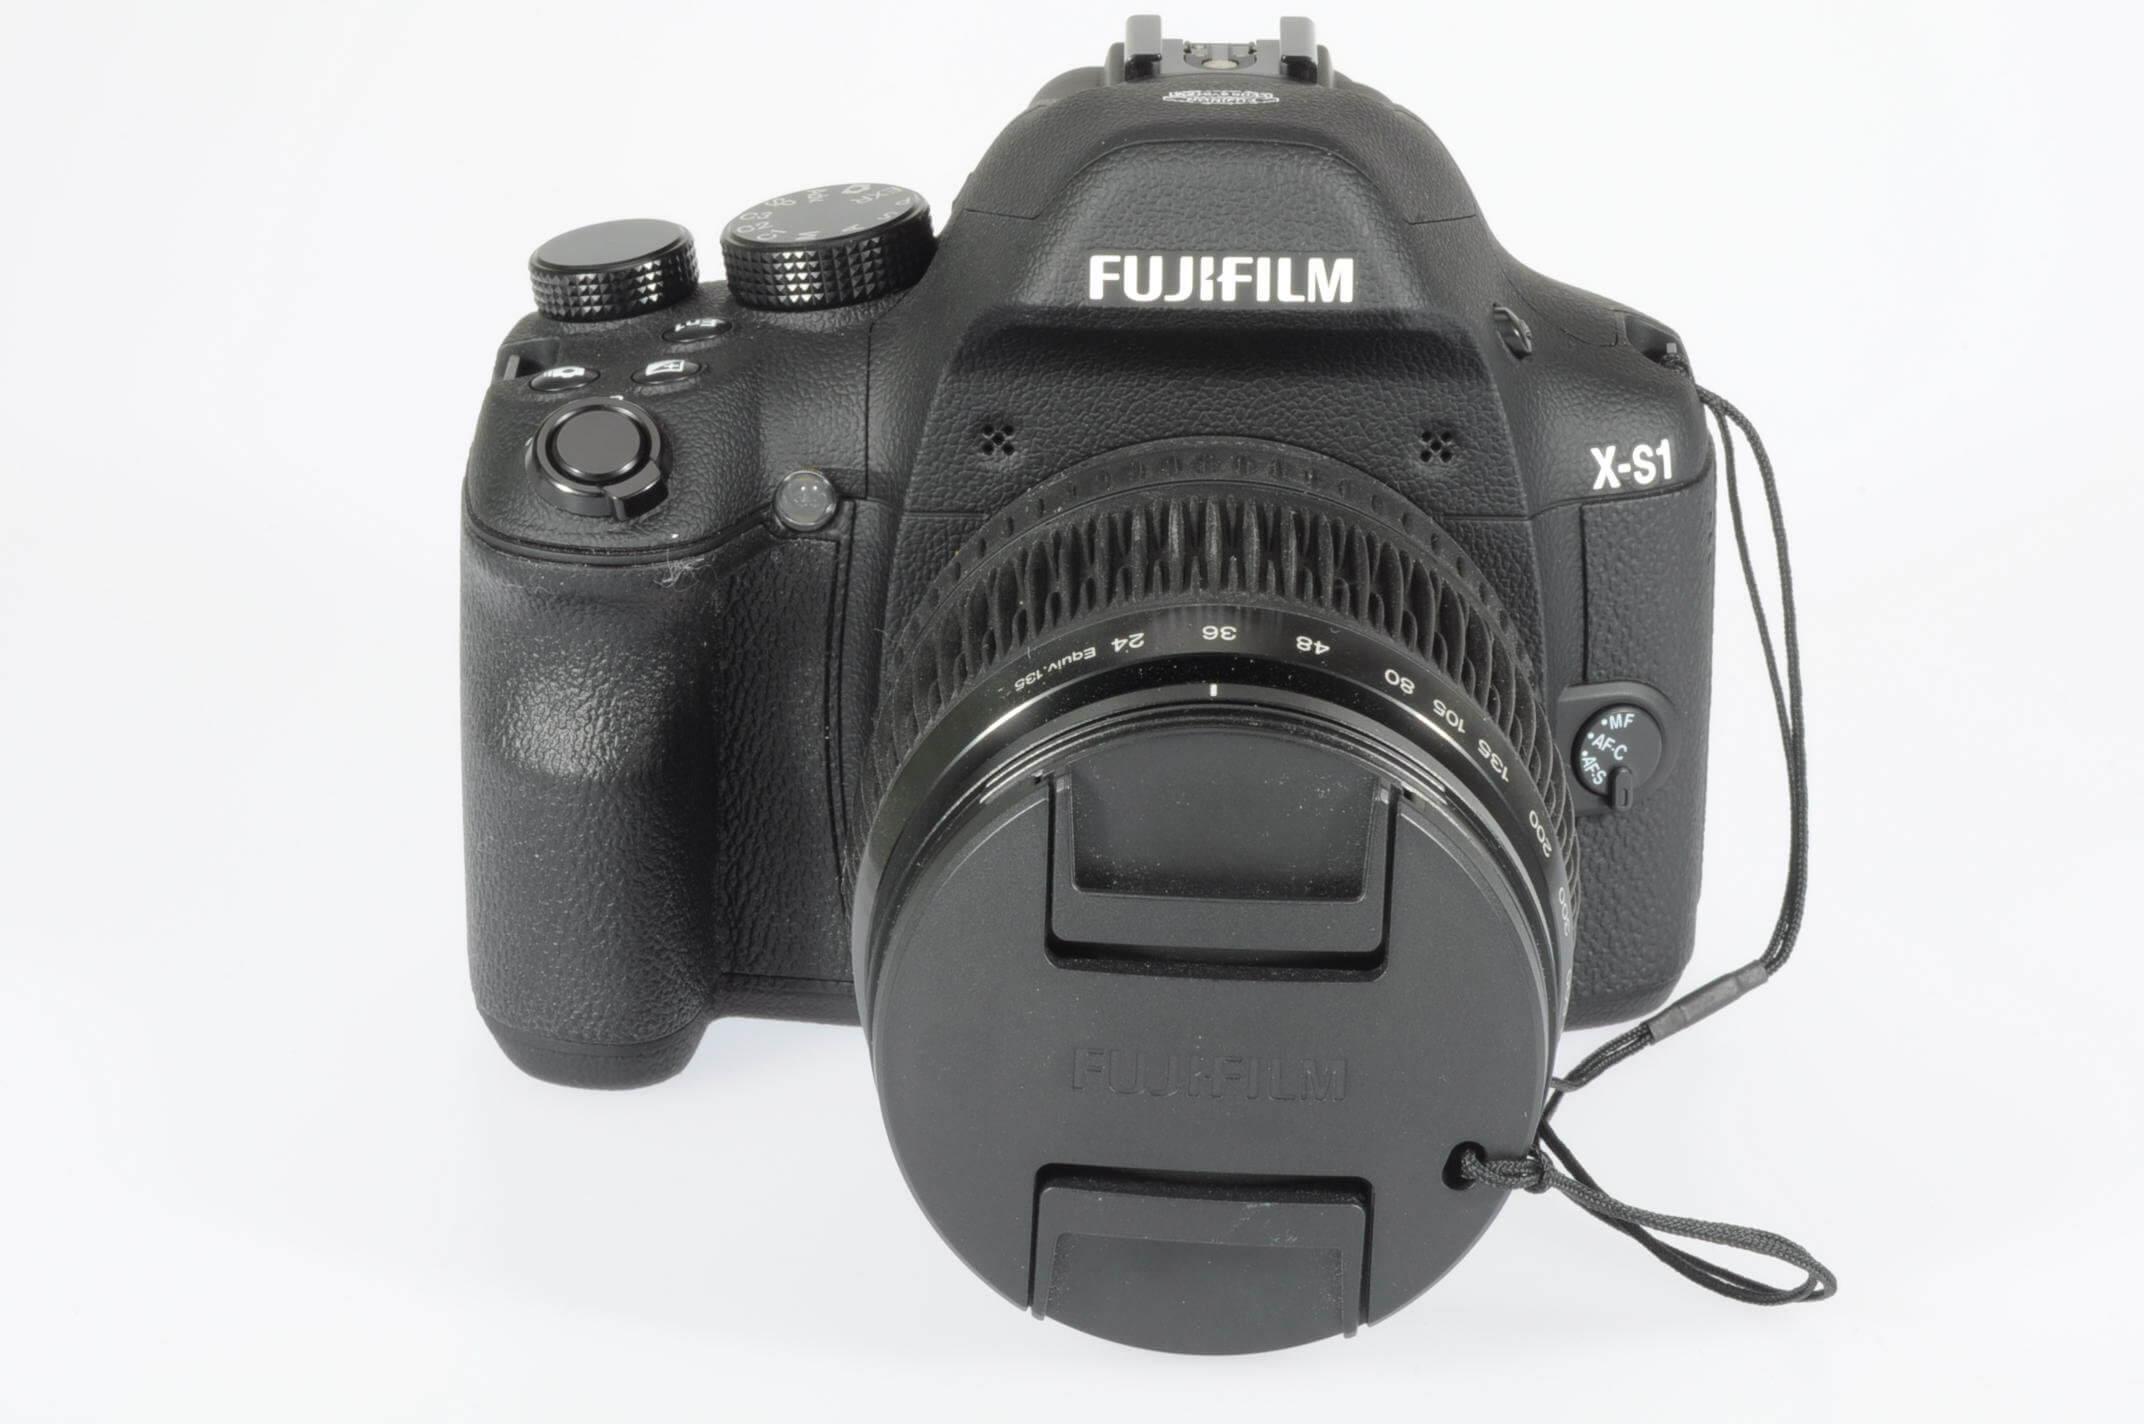 Fuji X-S1 camera, mint condition